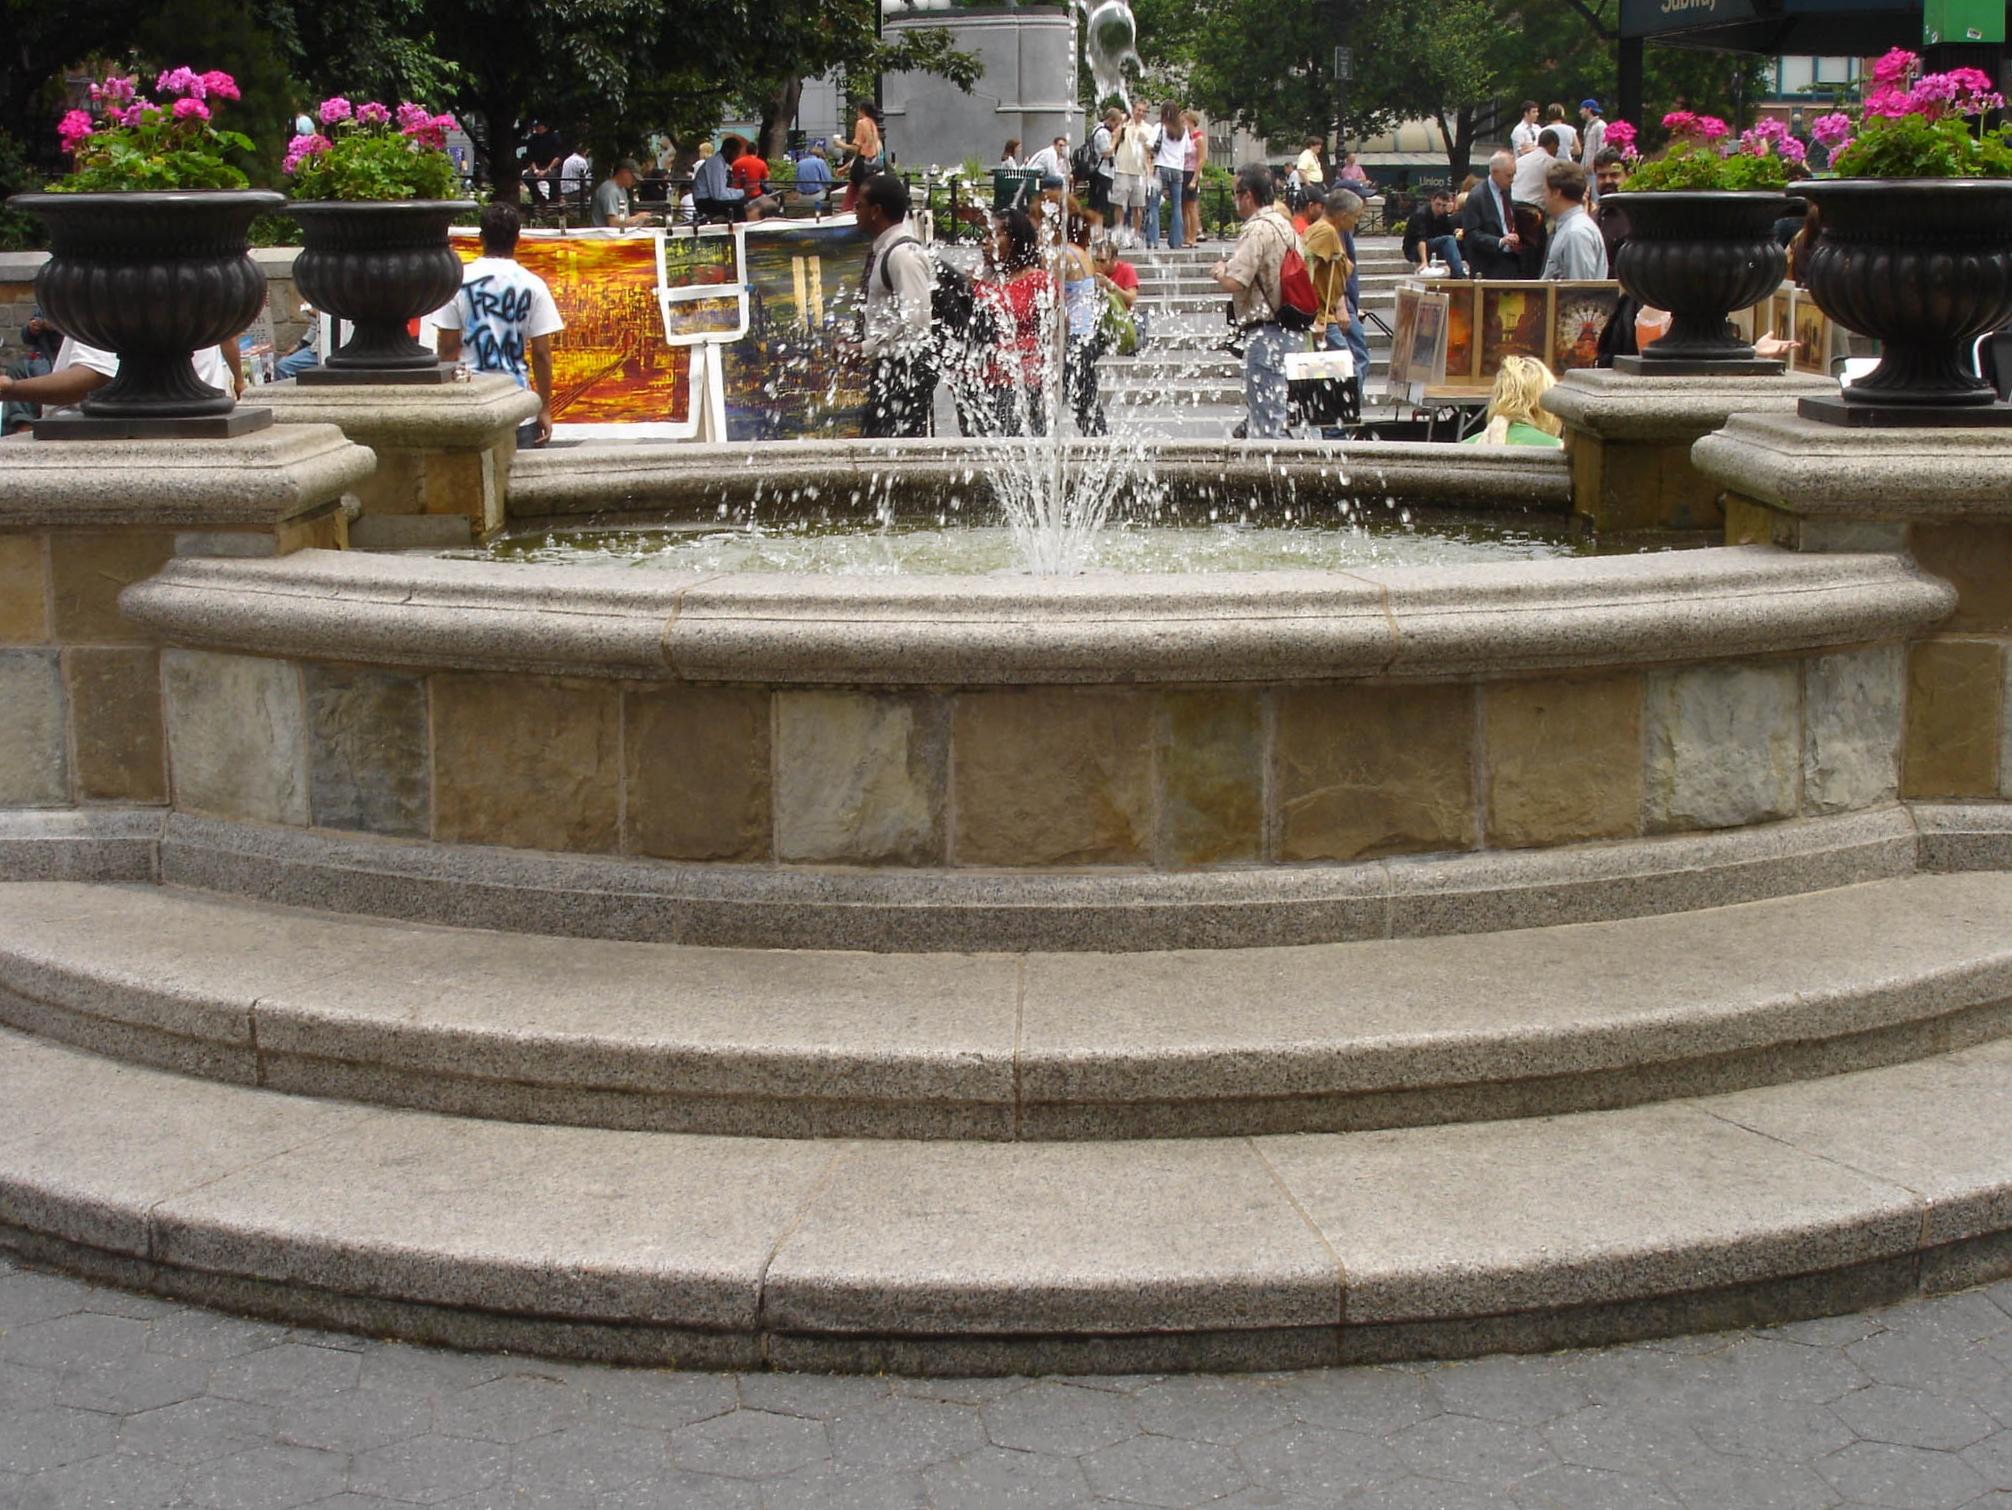 Union Square Park, Manhattan NY